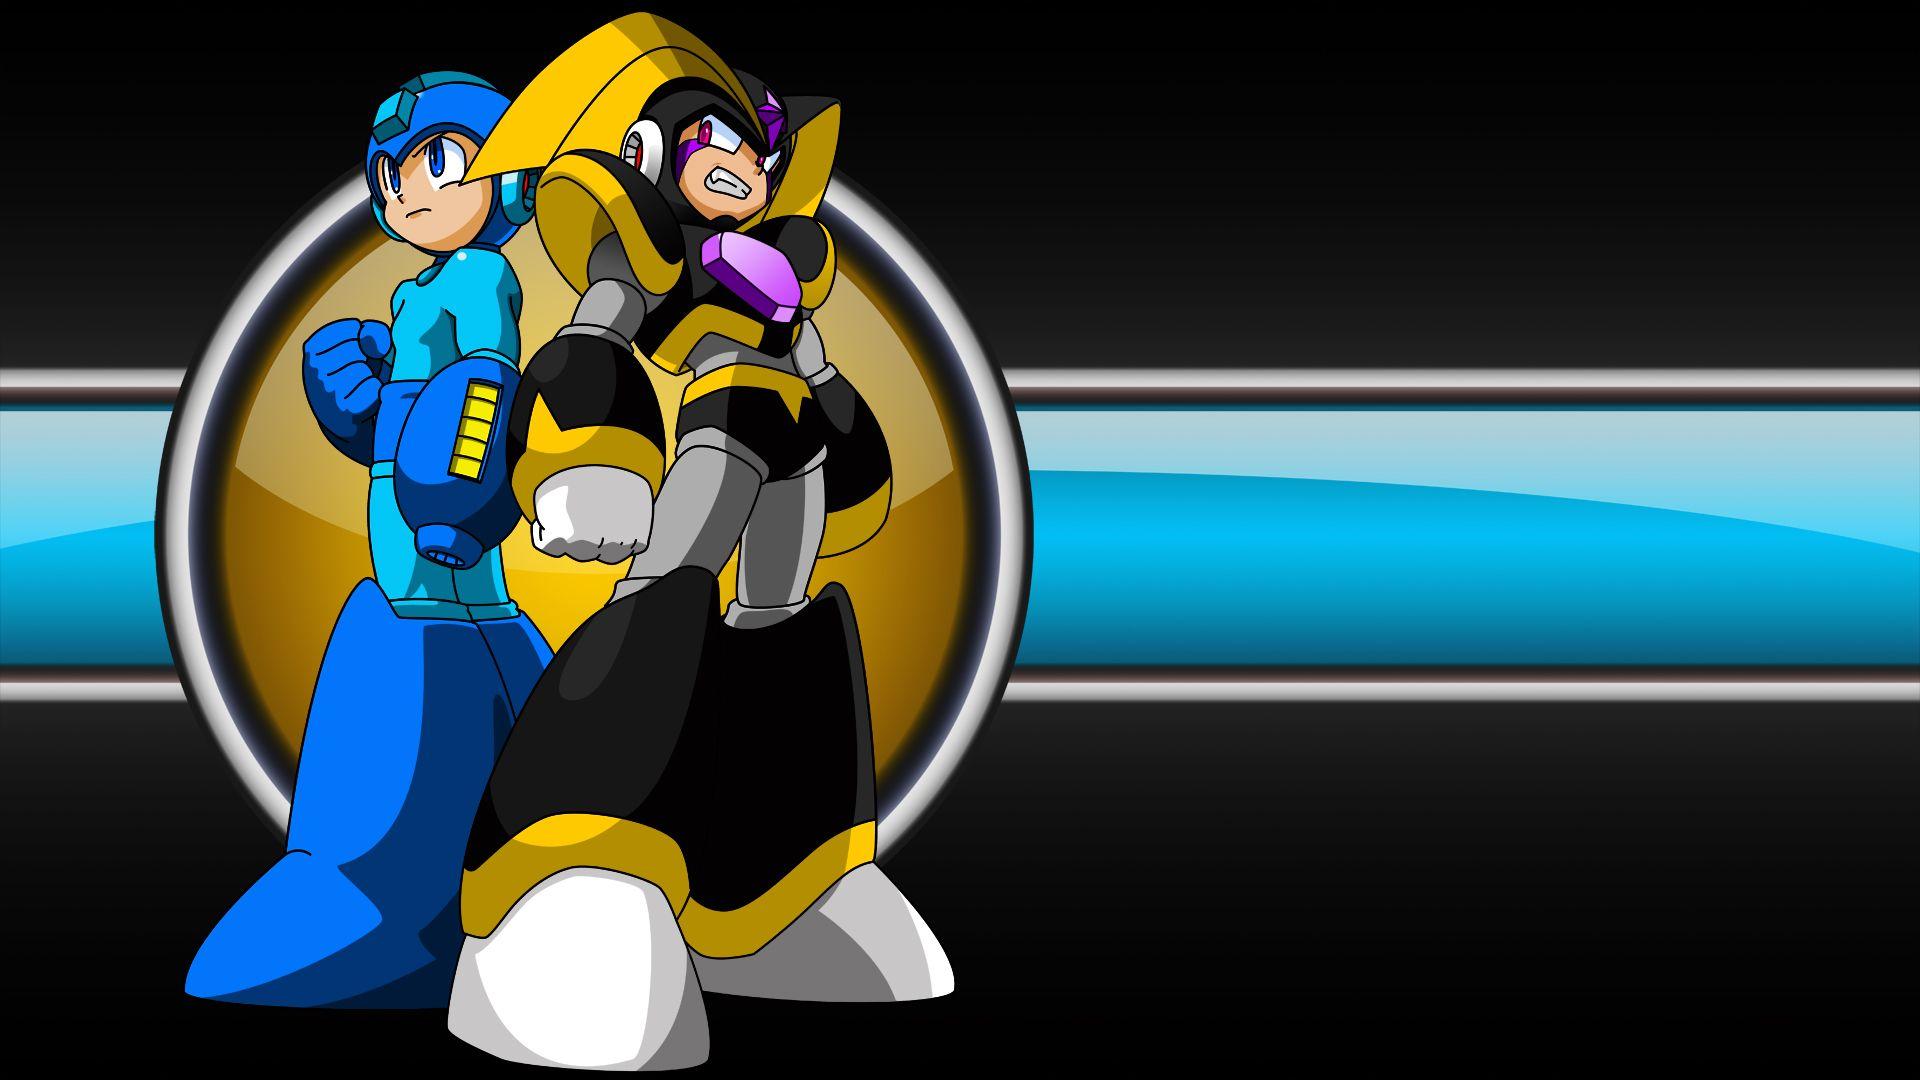 Megaman Bass Wallpapers Phone Mega Man Phone Background Patterns Man Wallpaper